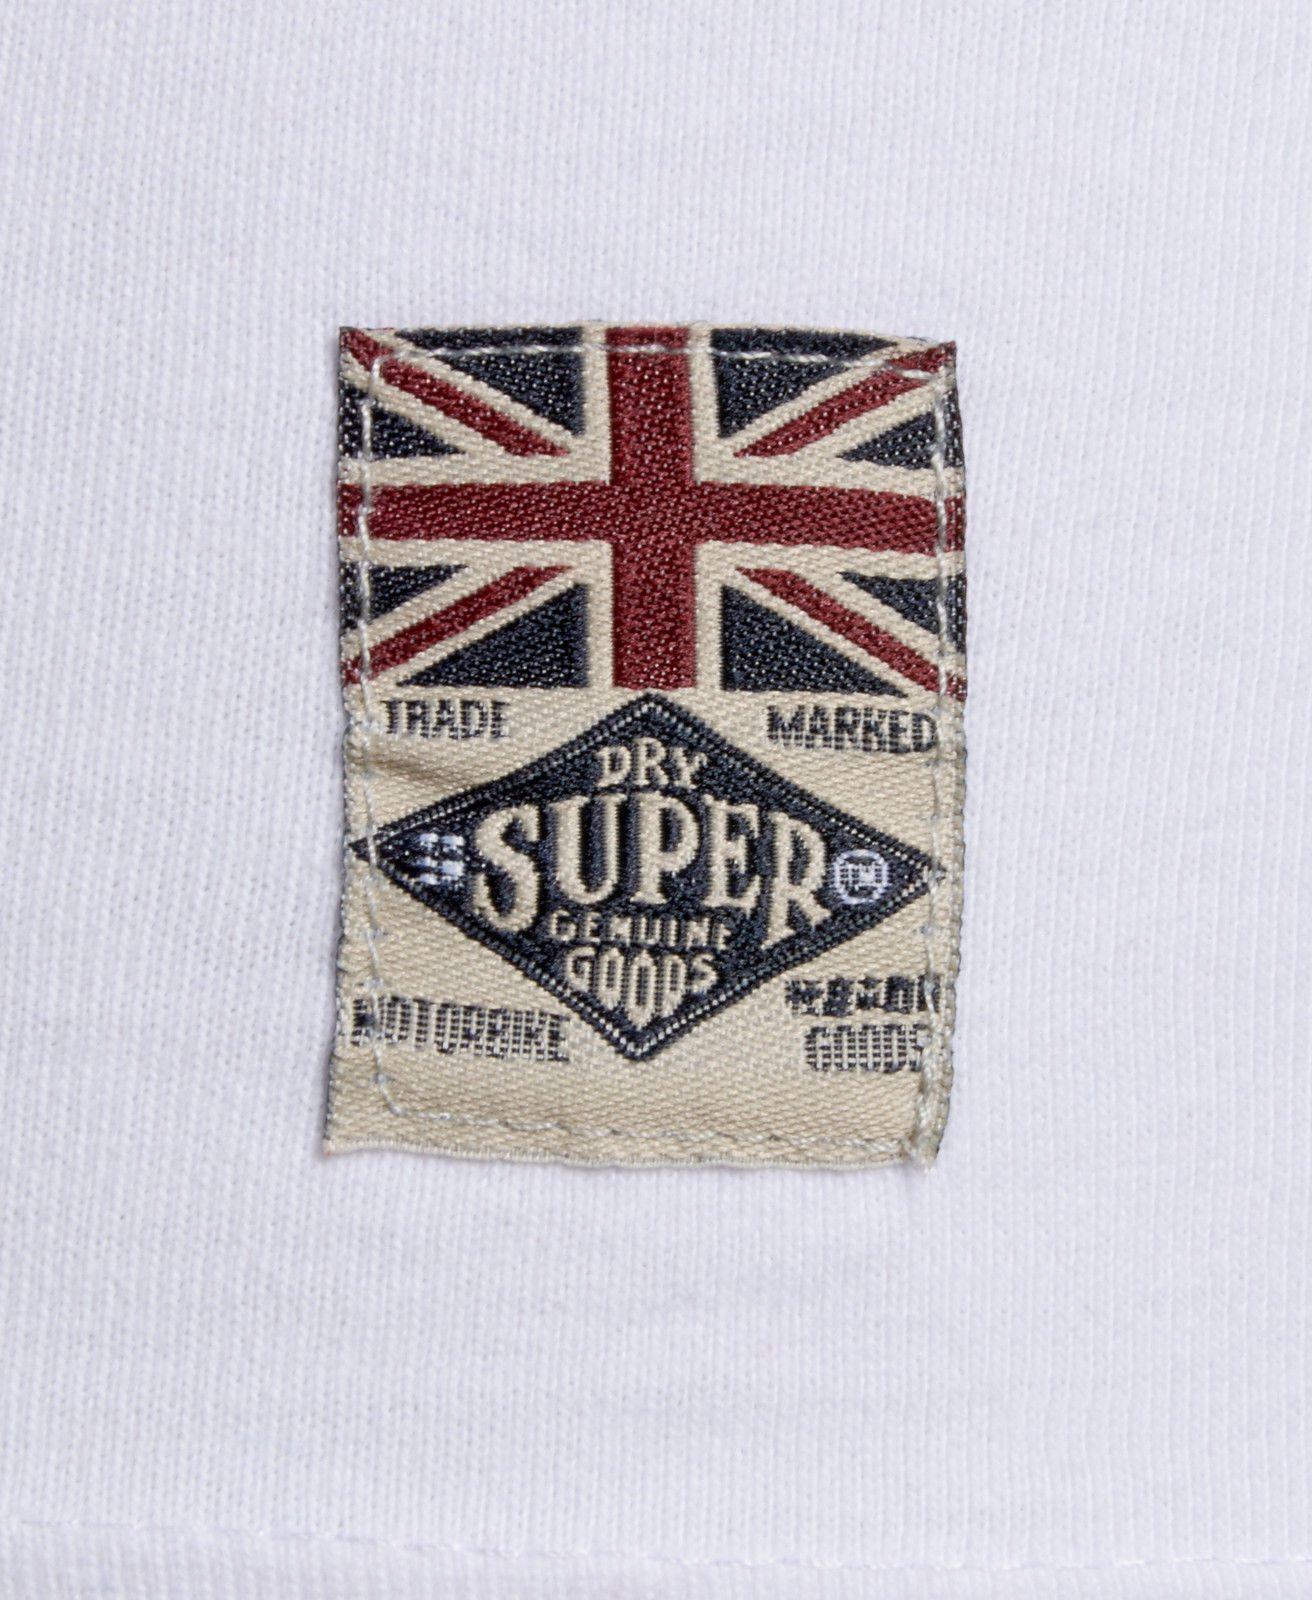 Design t shirt label - Details About New Mens Superdry Factory Second Leathers Classic Biker T Shirt Optic